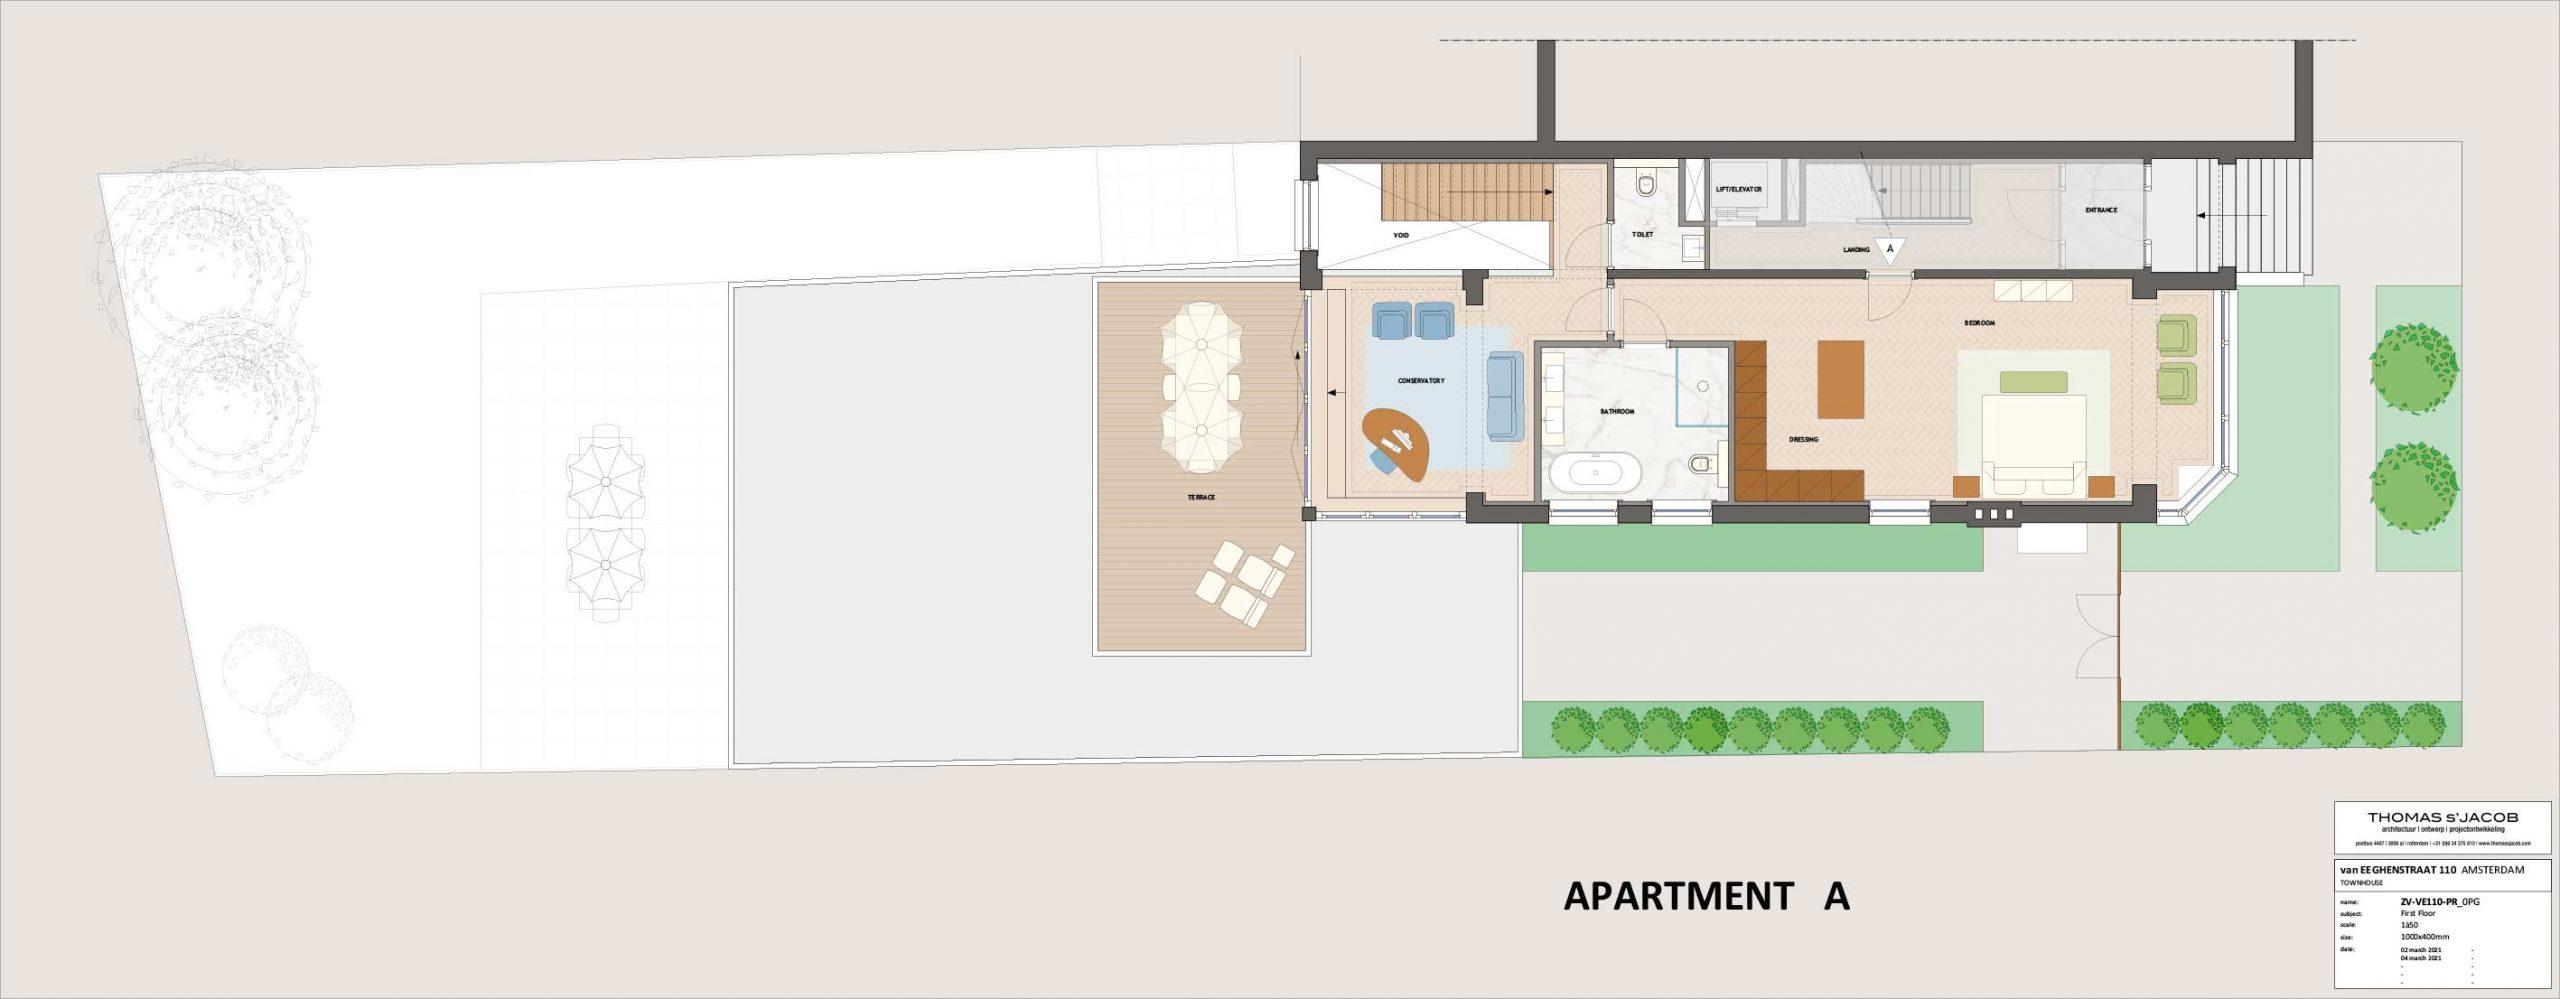 plattegrond vaneeghenstraat 110 appartement A eerste verdieping